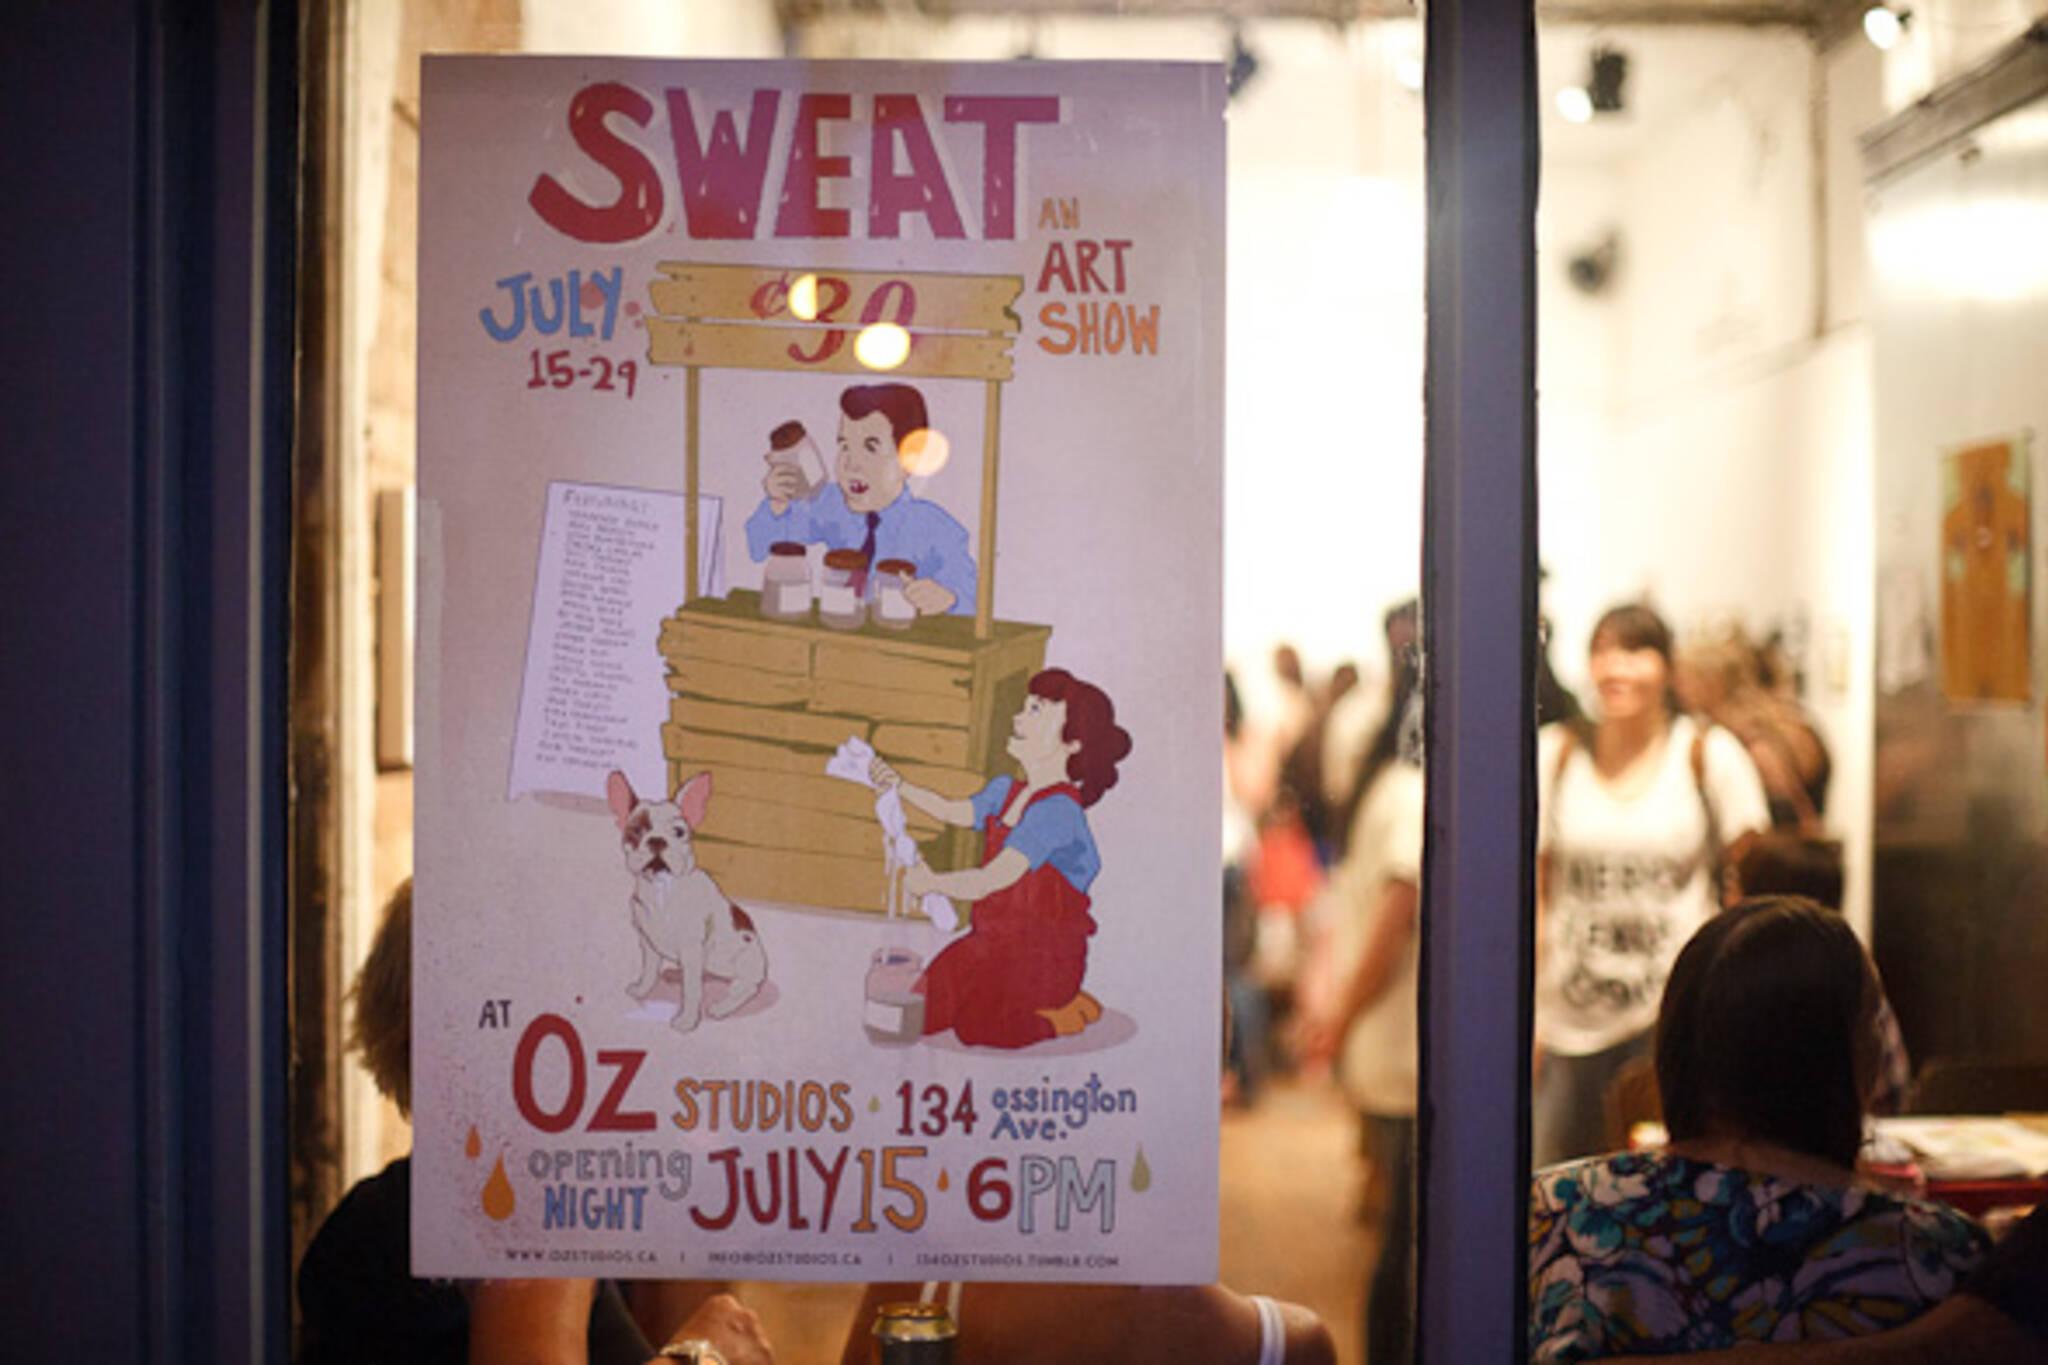 Sweat Art Show